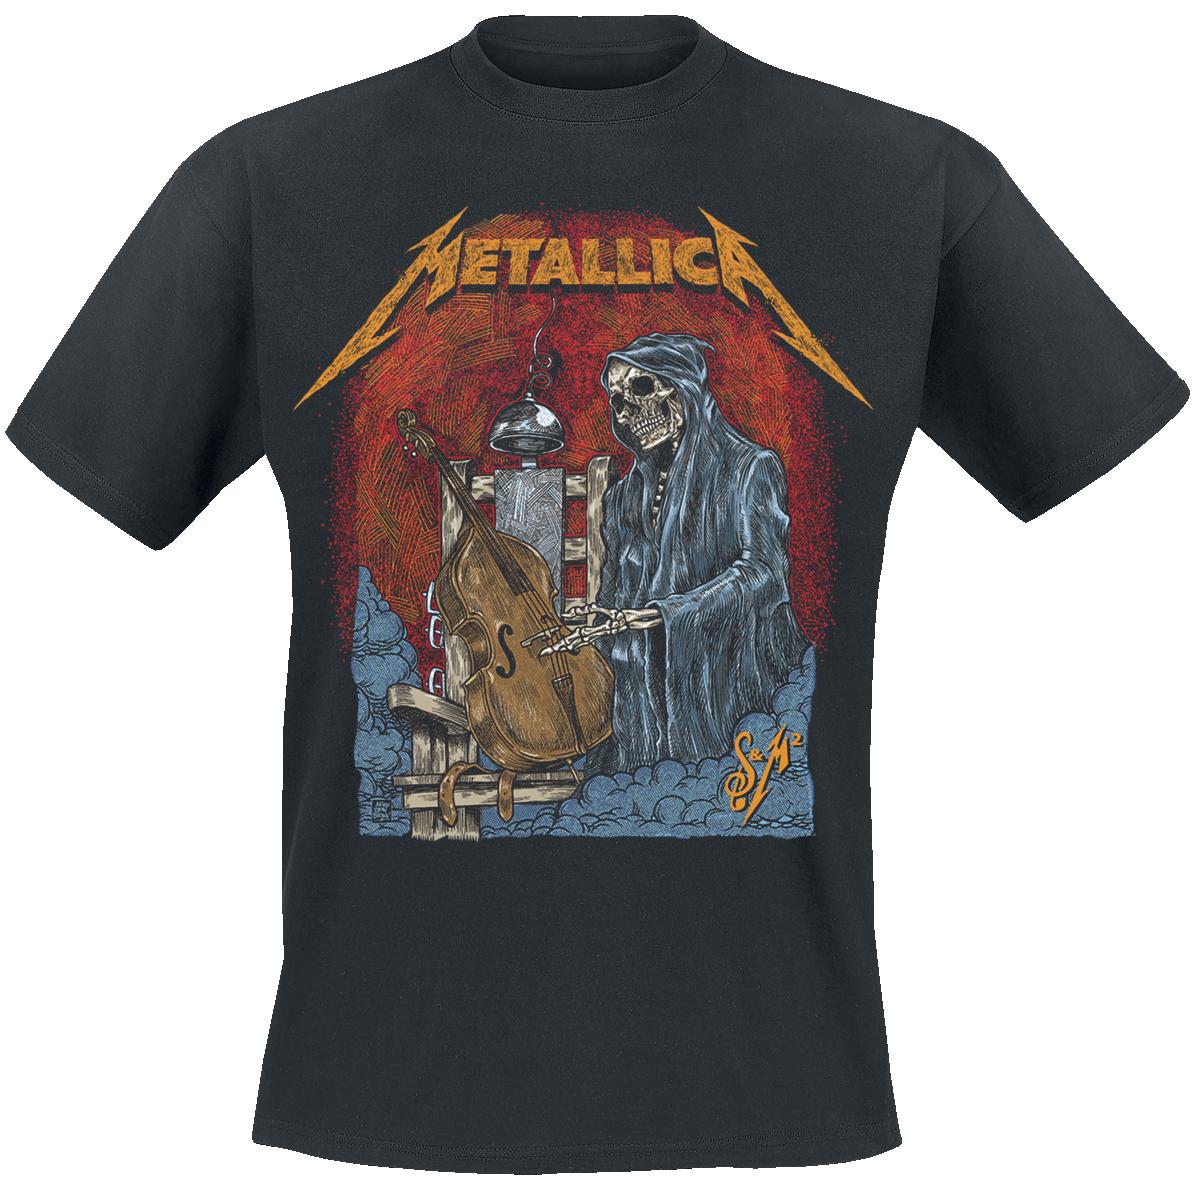 Metallica - S&M2 Cello Reaper - T-Shirt - black image